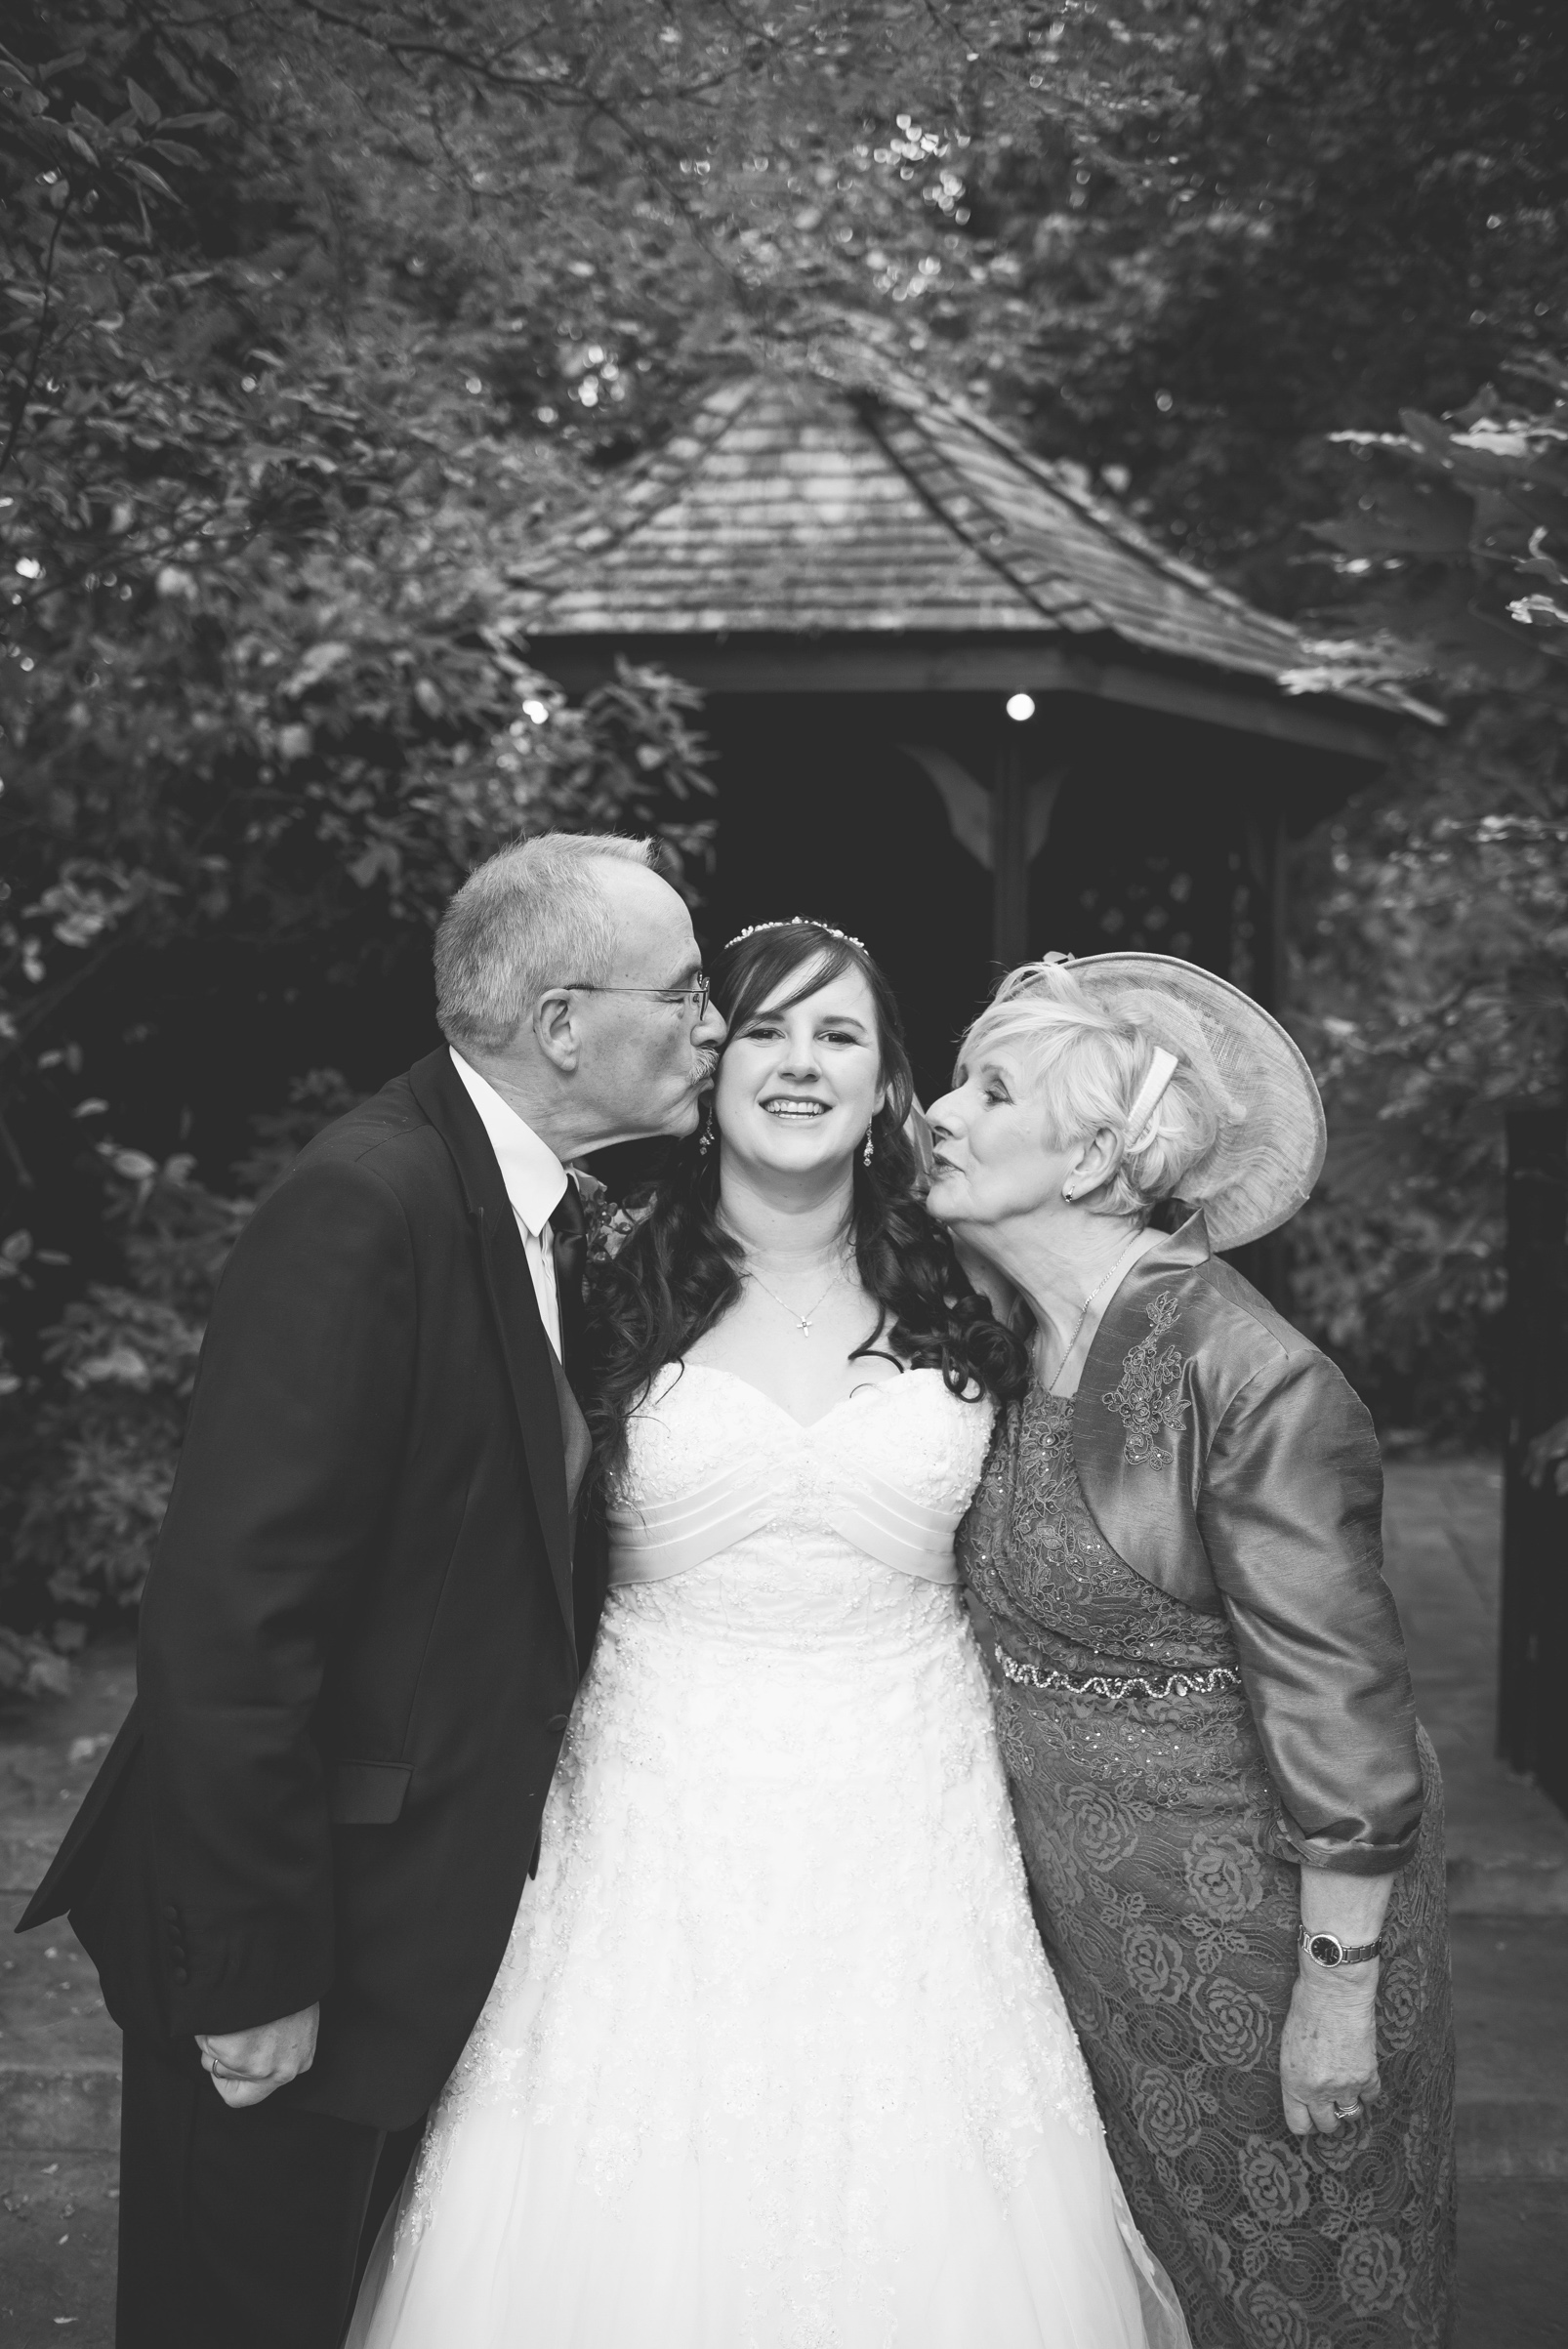 The+Fairlawns+wedding+Aldridge+StLukes+Church-150.jpg